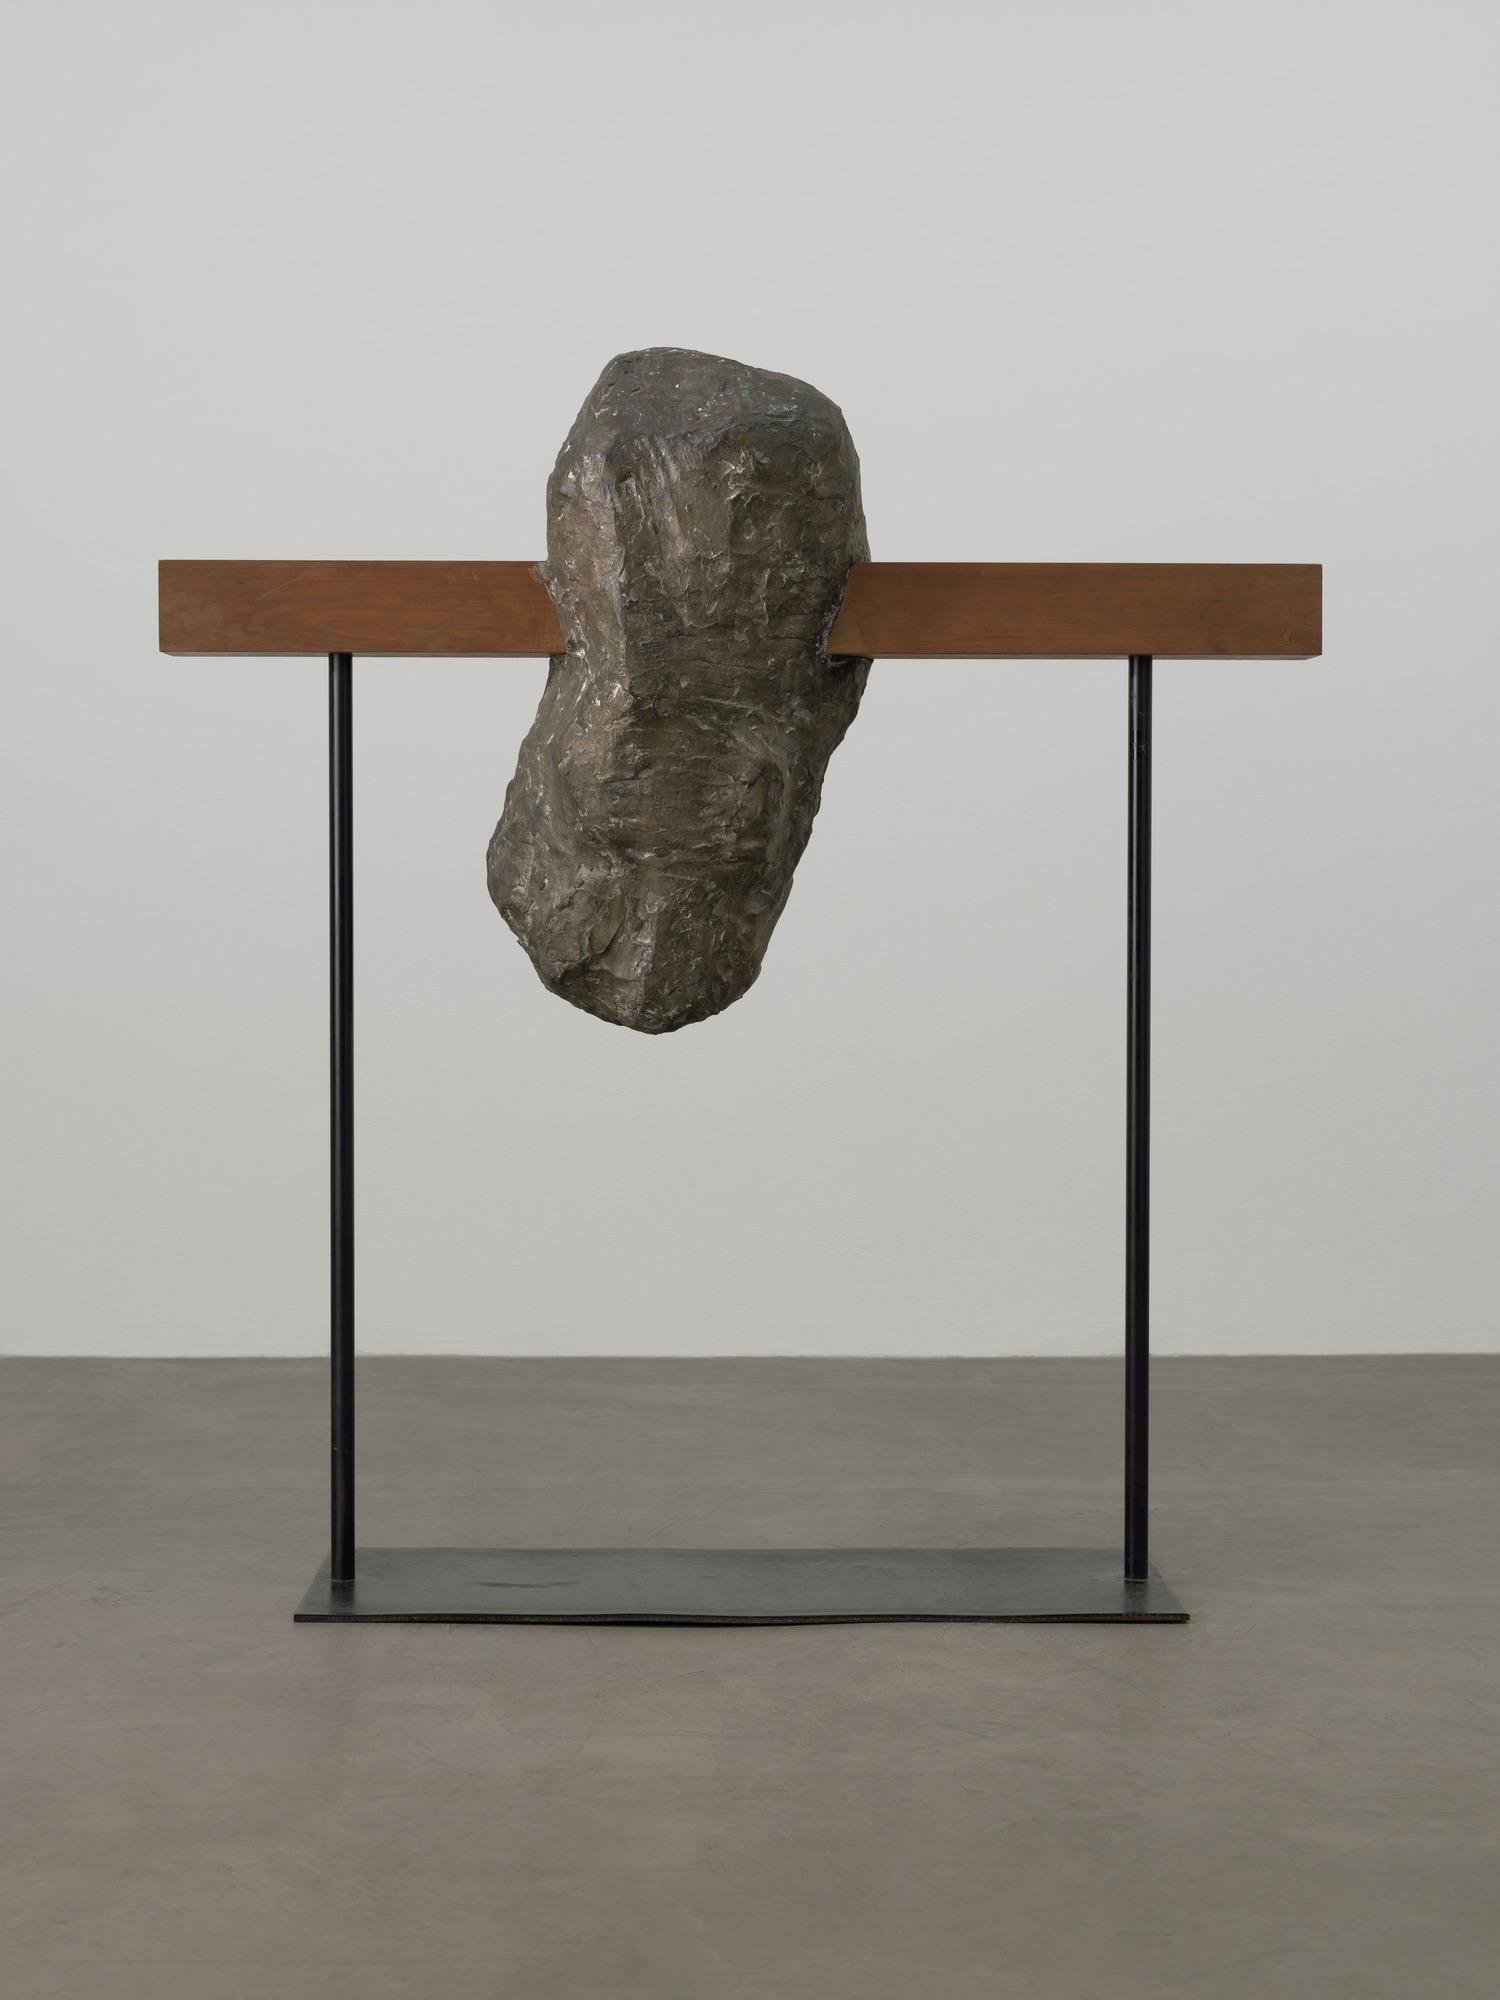 Sculpture- Nogushi-Moma -Inspiration-Céline-wright.jpg